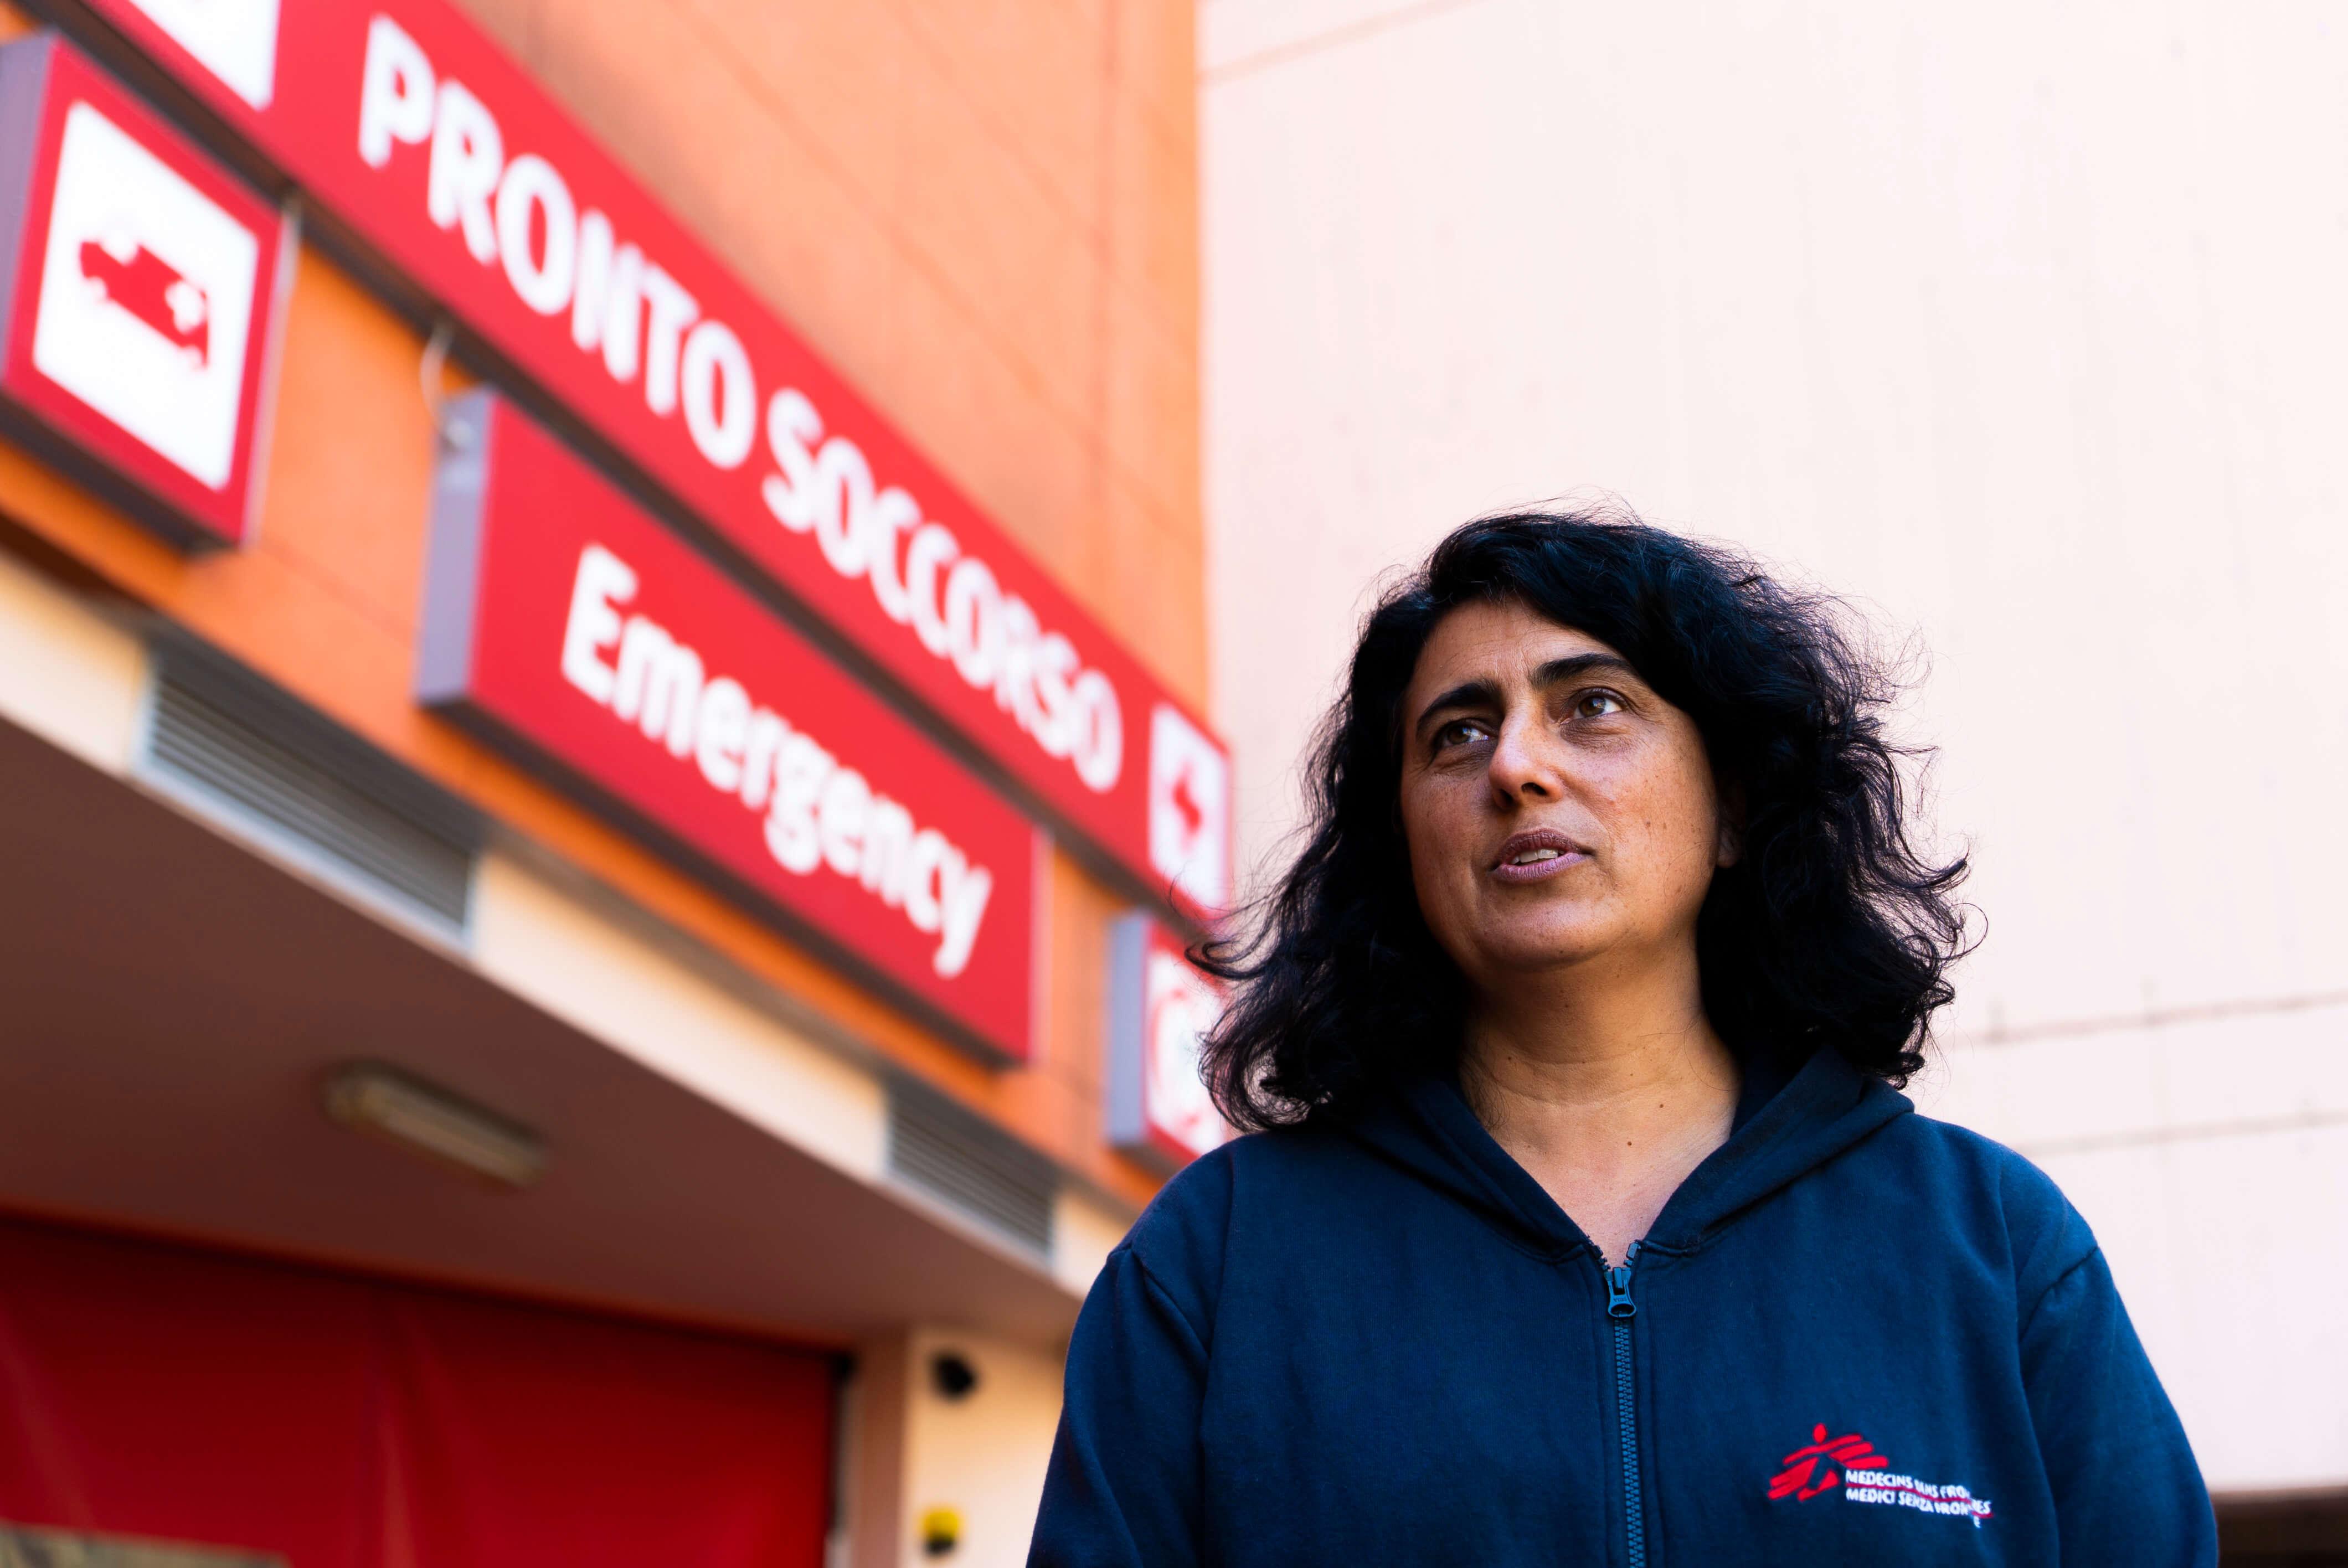 Claudia Lodesani presidente MSF Italia a Lodi